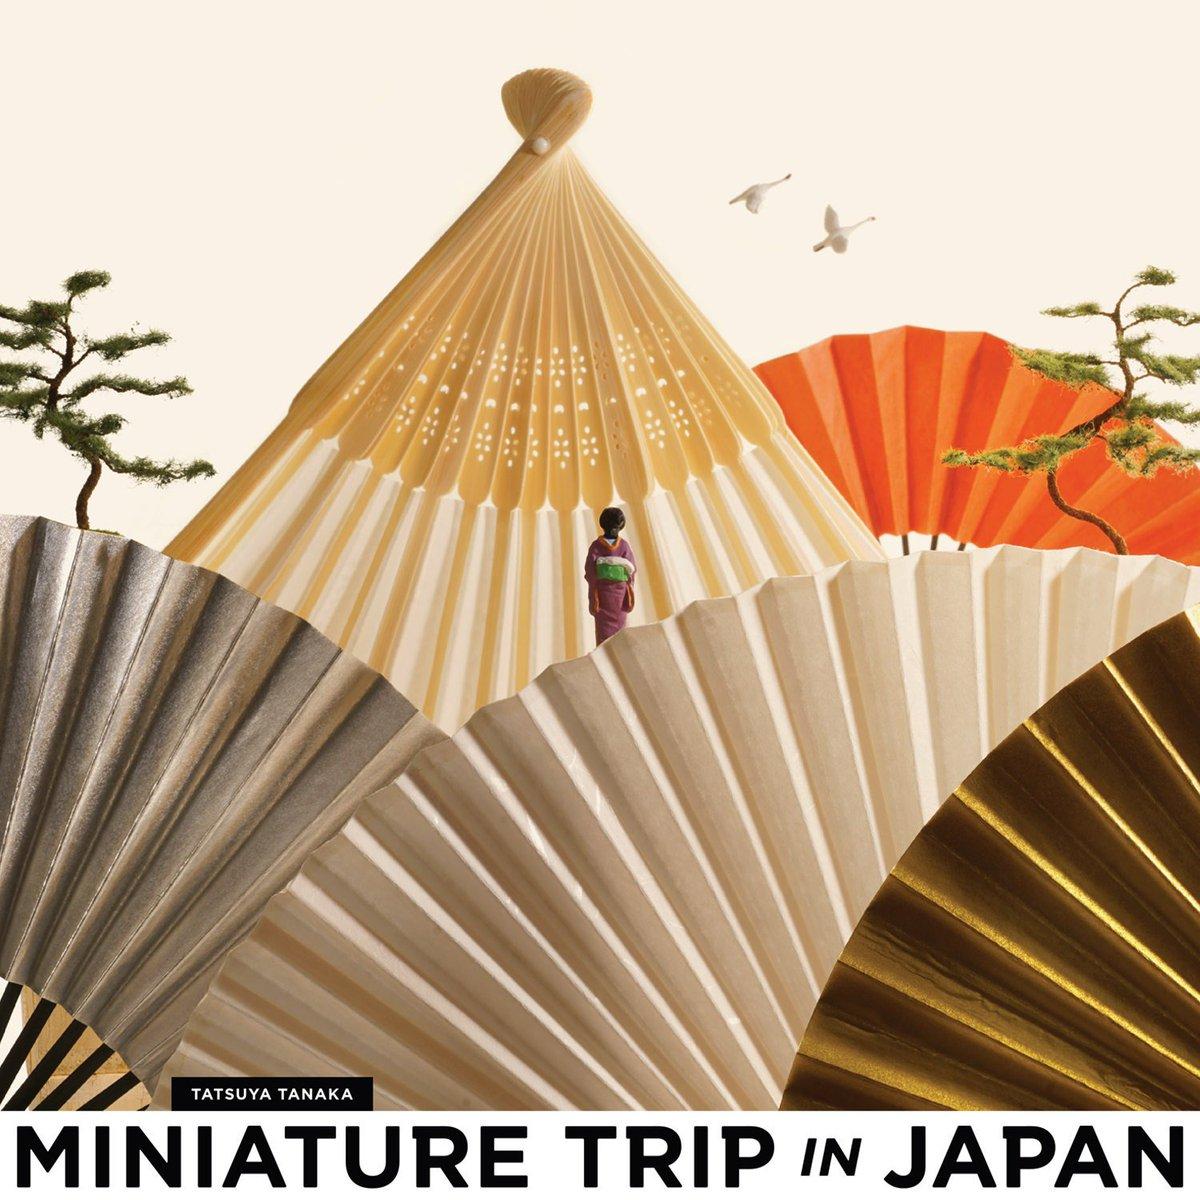 【MINIATURE TRIP IN JAPAN】小学館より11月20日発売!数ある作品の中から日本らしさを感じさせる風景や物、食べ物をだけをセレクトし、1冊の本にまとめました。ふだんの暮らしの中にある身近なもので表現した日本の魅力を堪能してください。